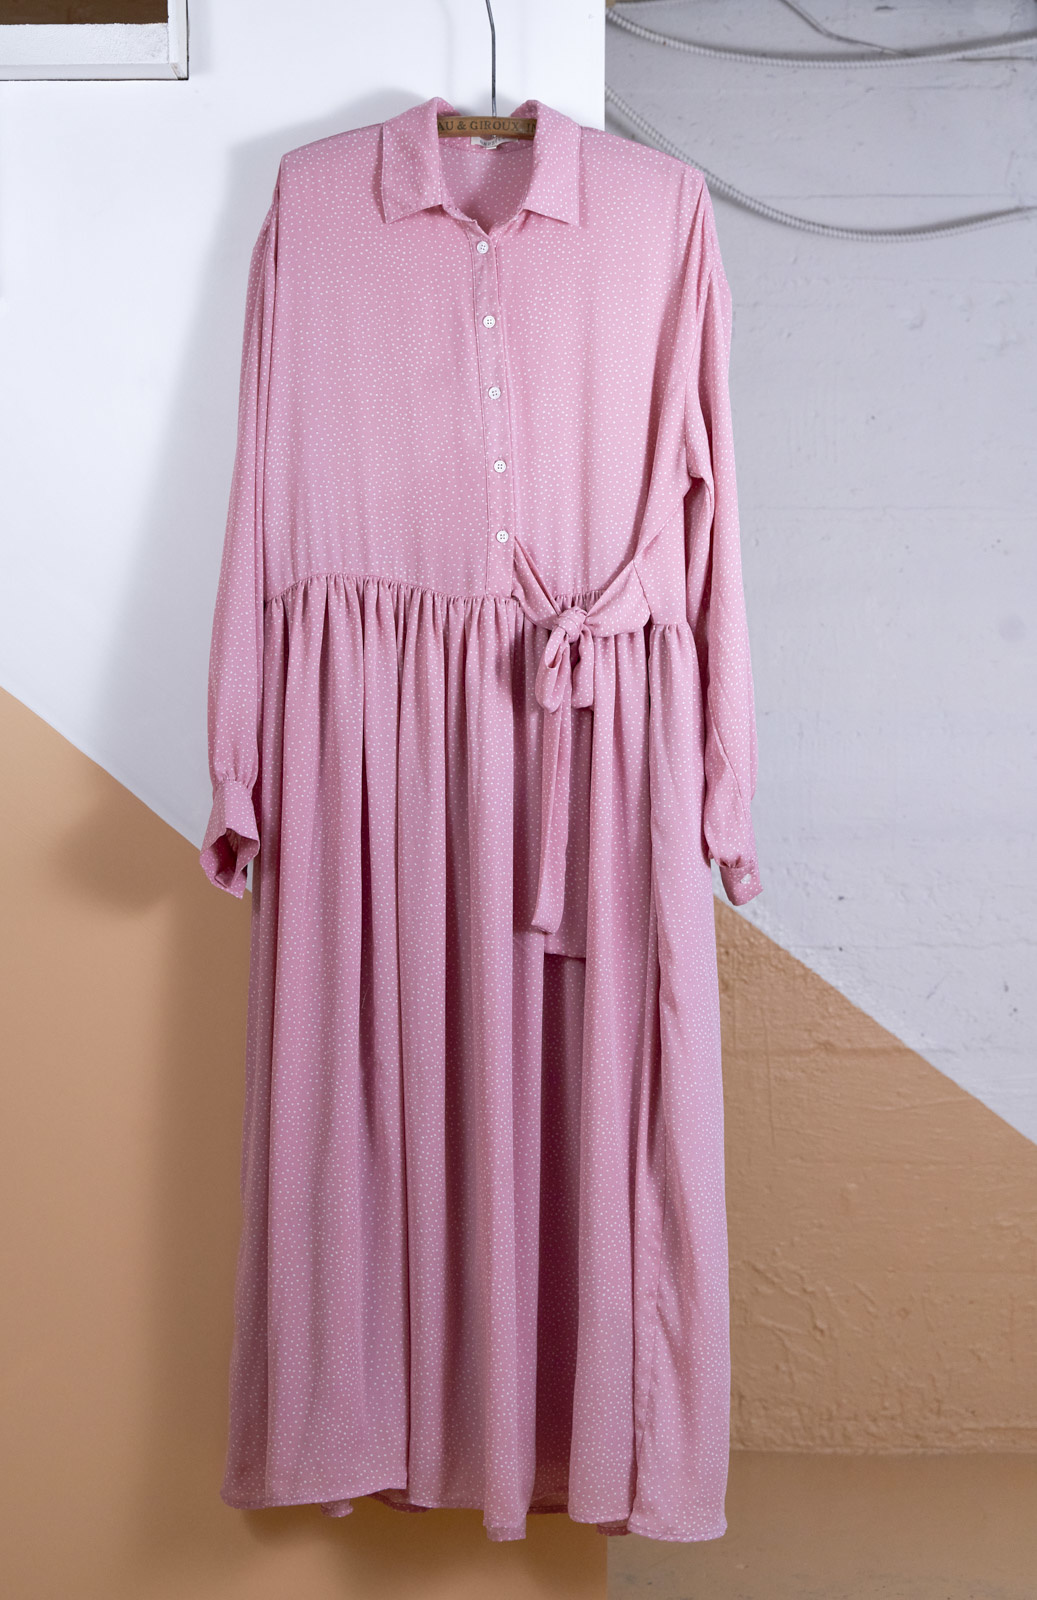 Robe longue ample rose pois blanc